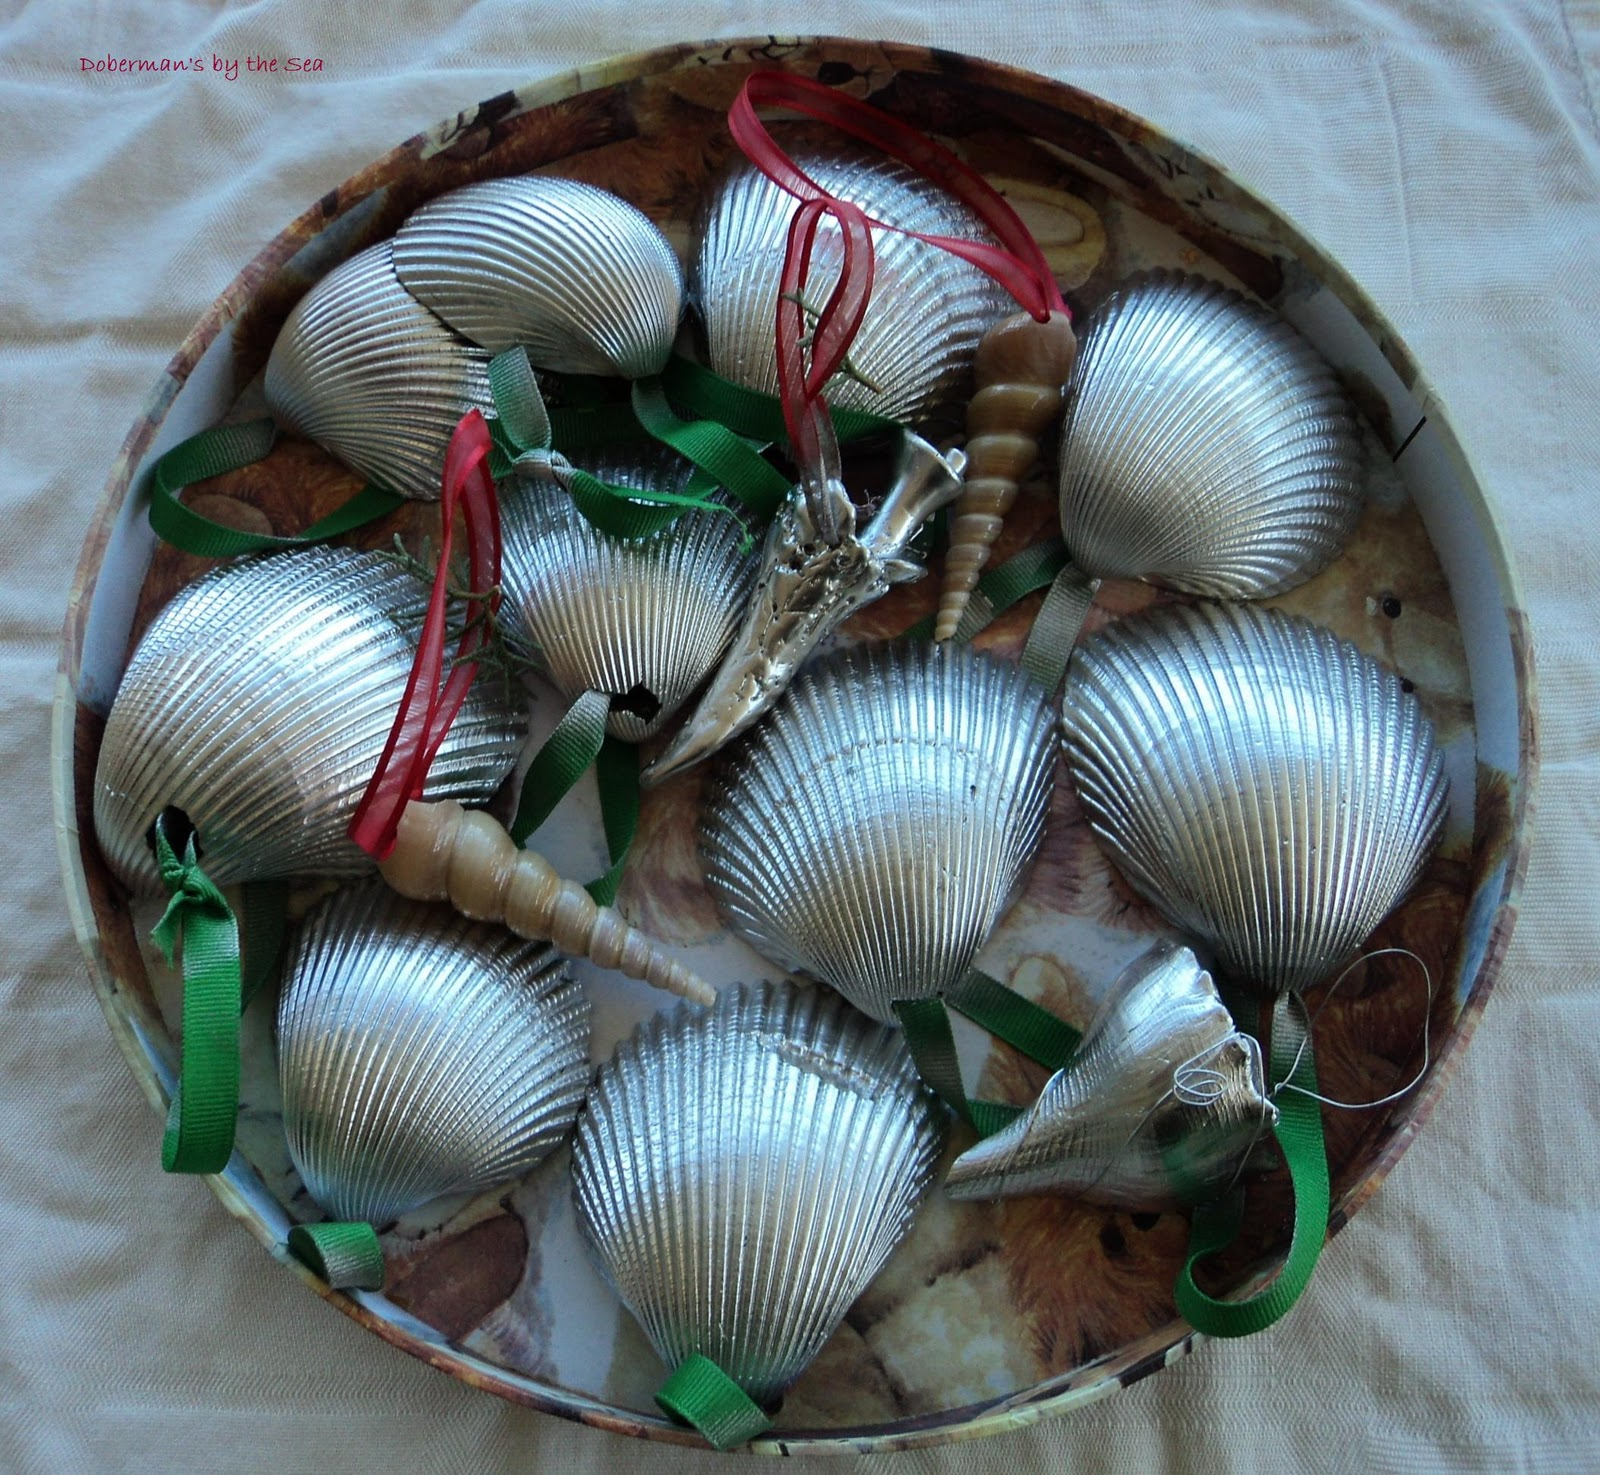 Doberman 39 s by the sea diy sea shell garland ornaments for Seashell ornaments diy